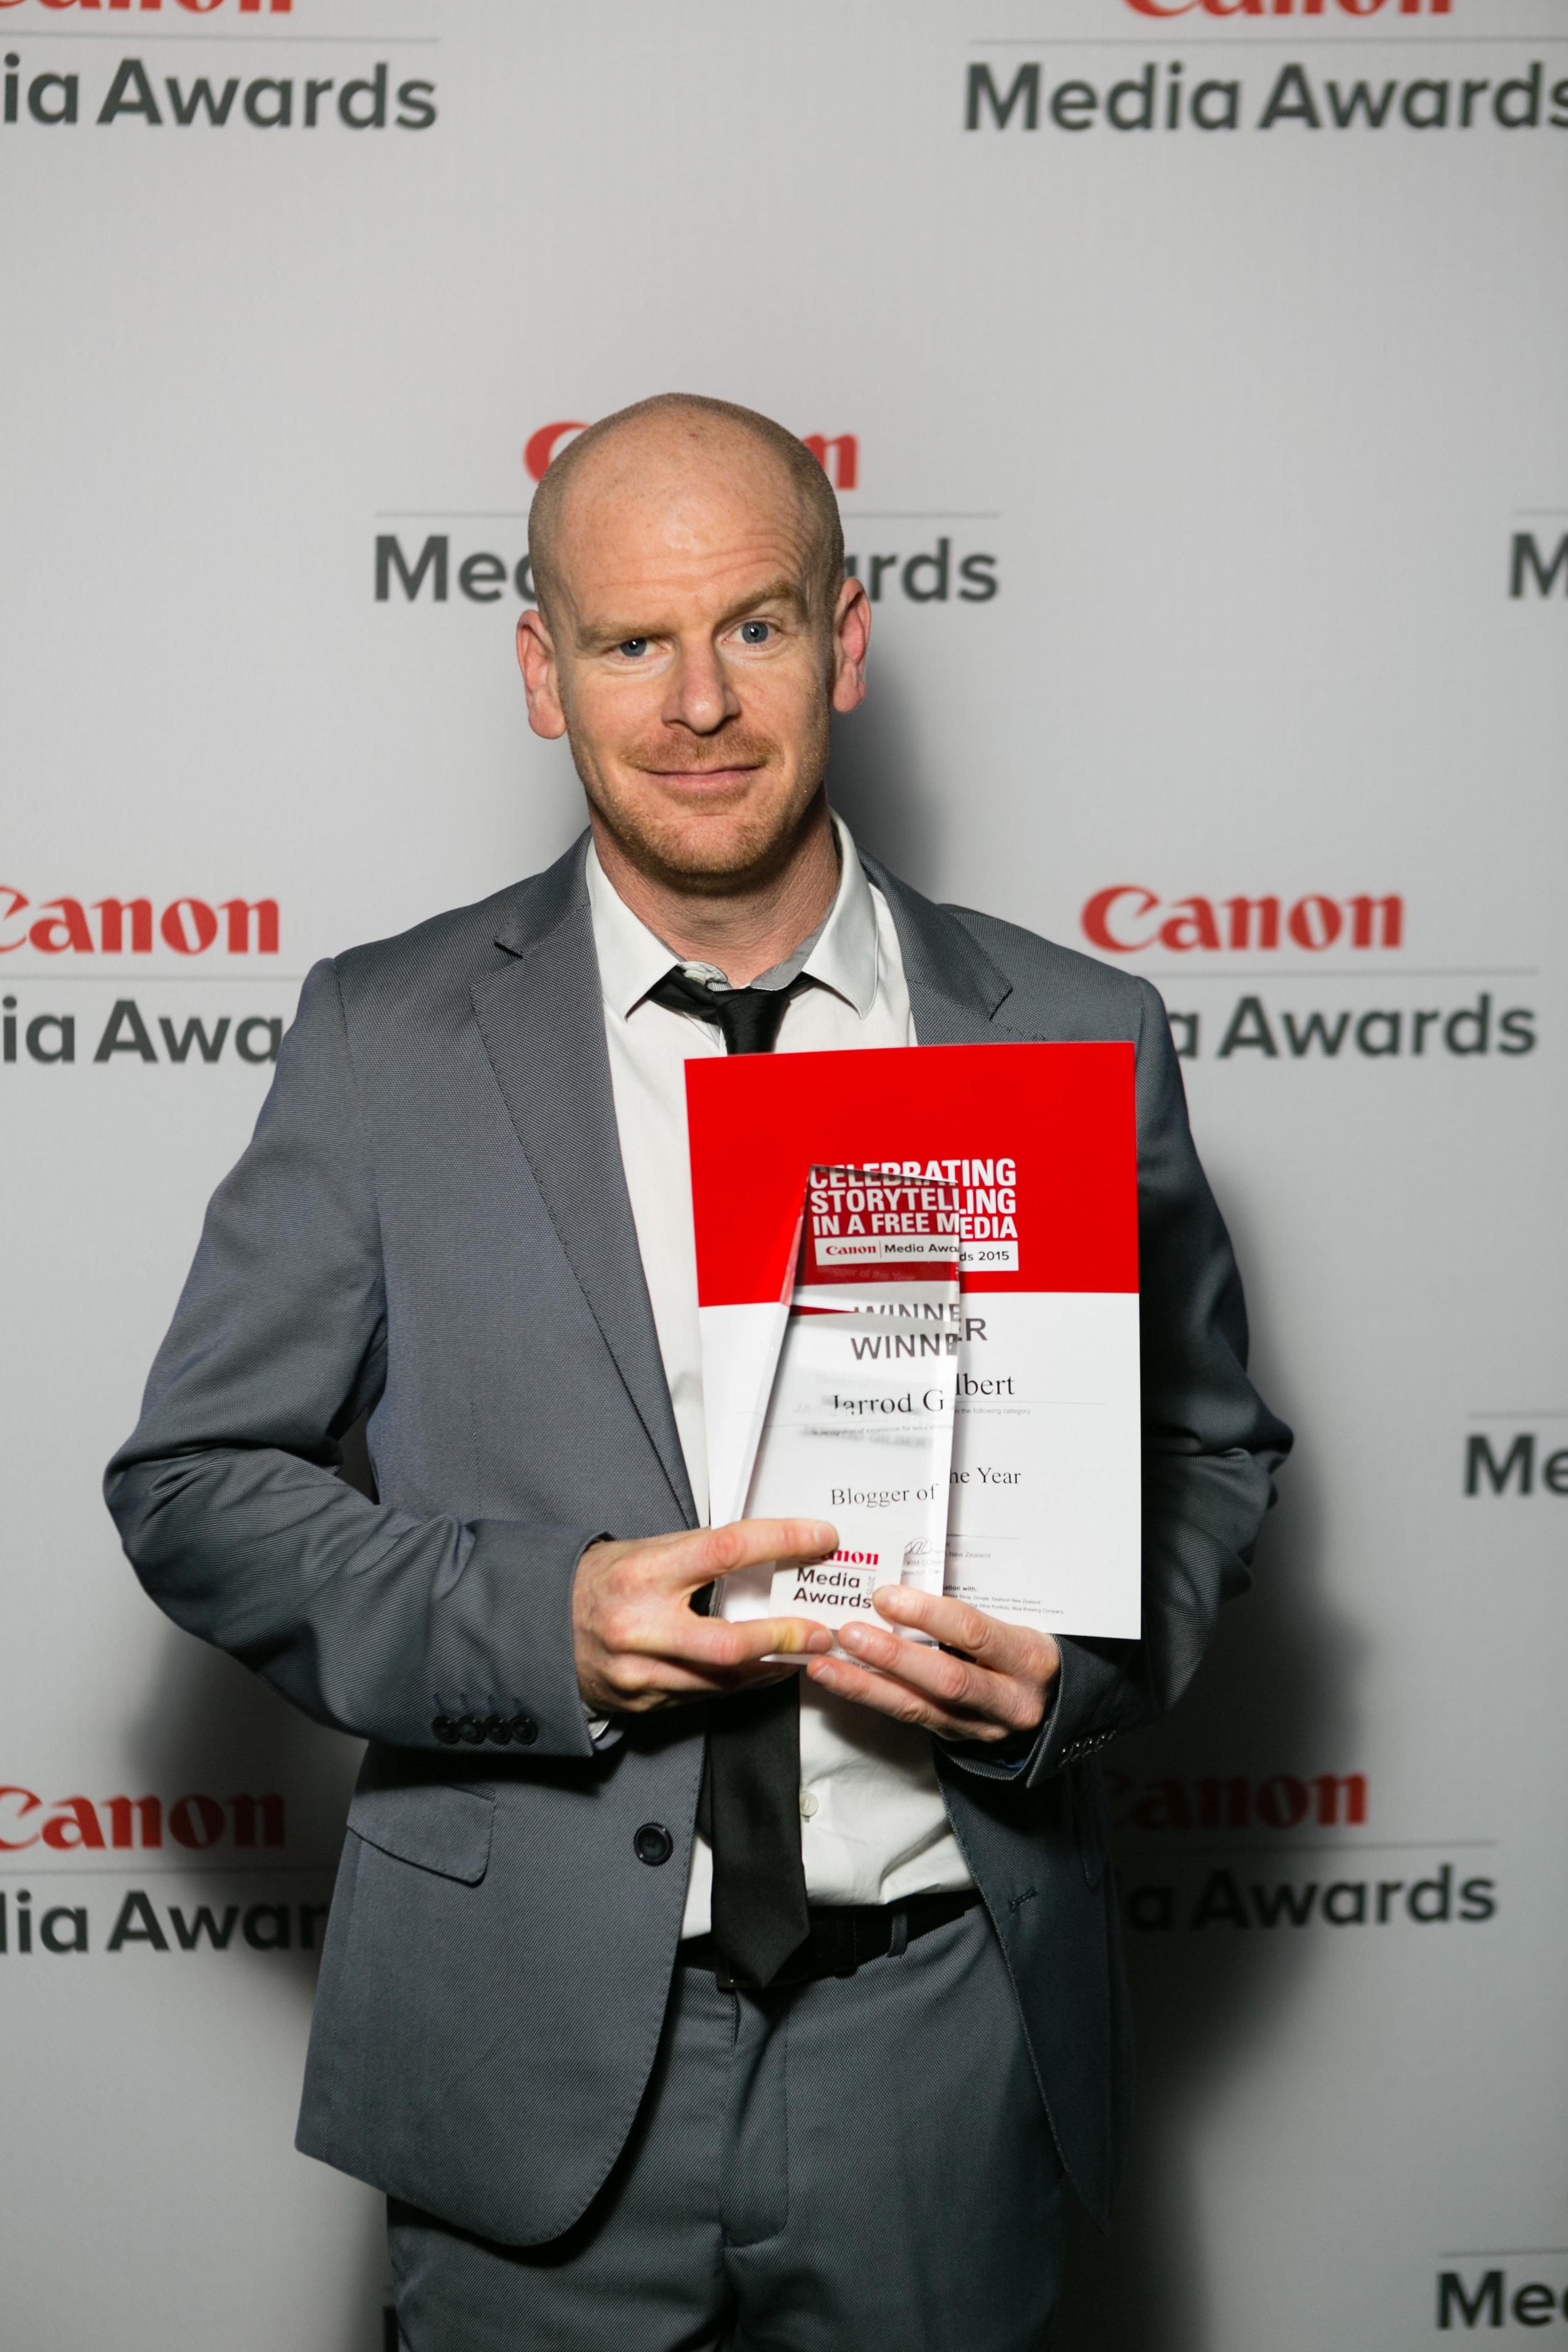 canon_media_awards_2015_interlike_nz_clinton_tudor-5968-204.jpg